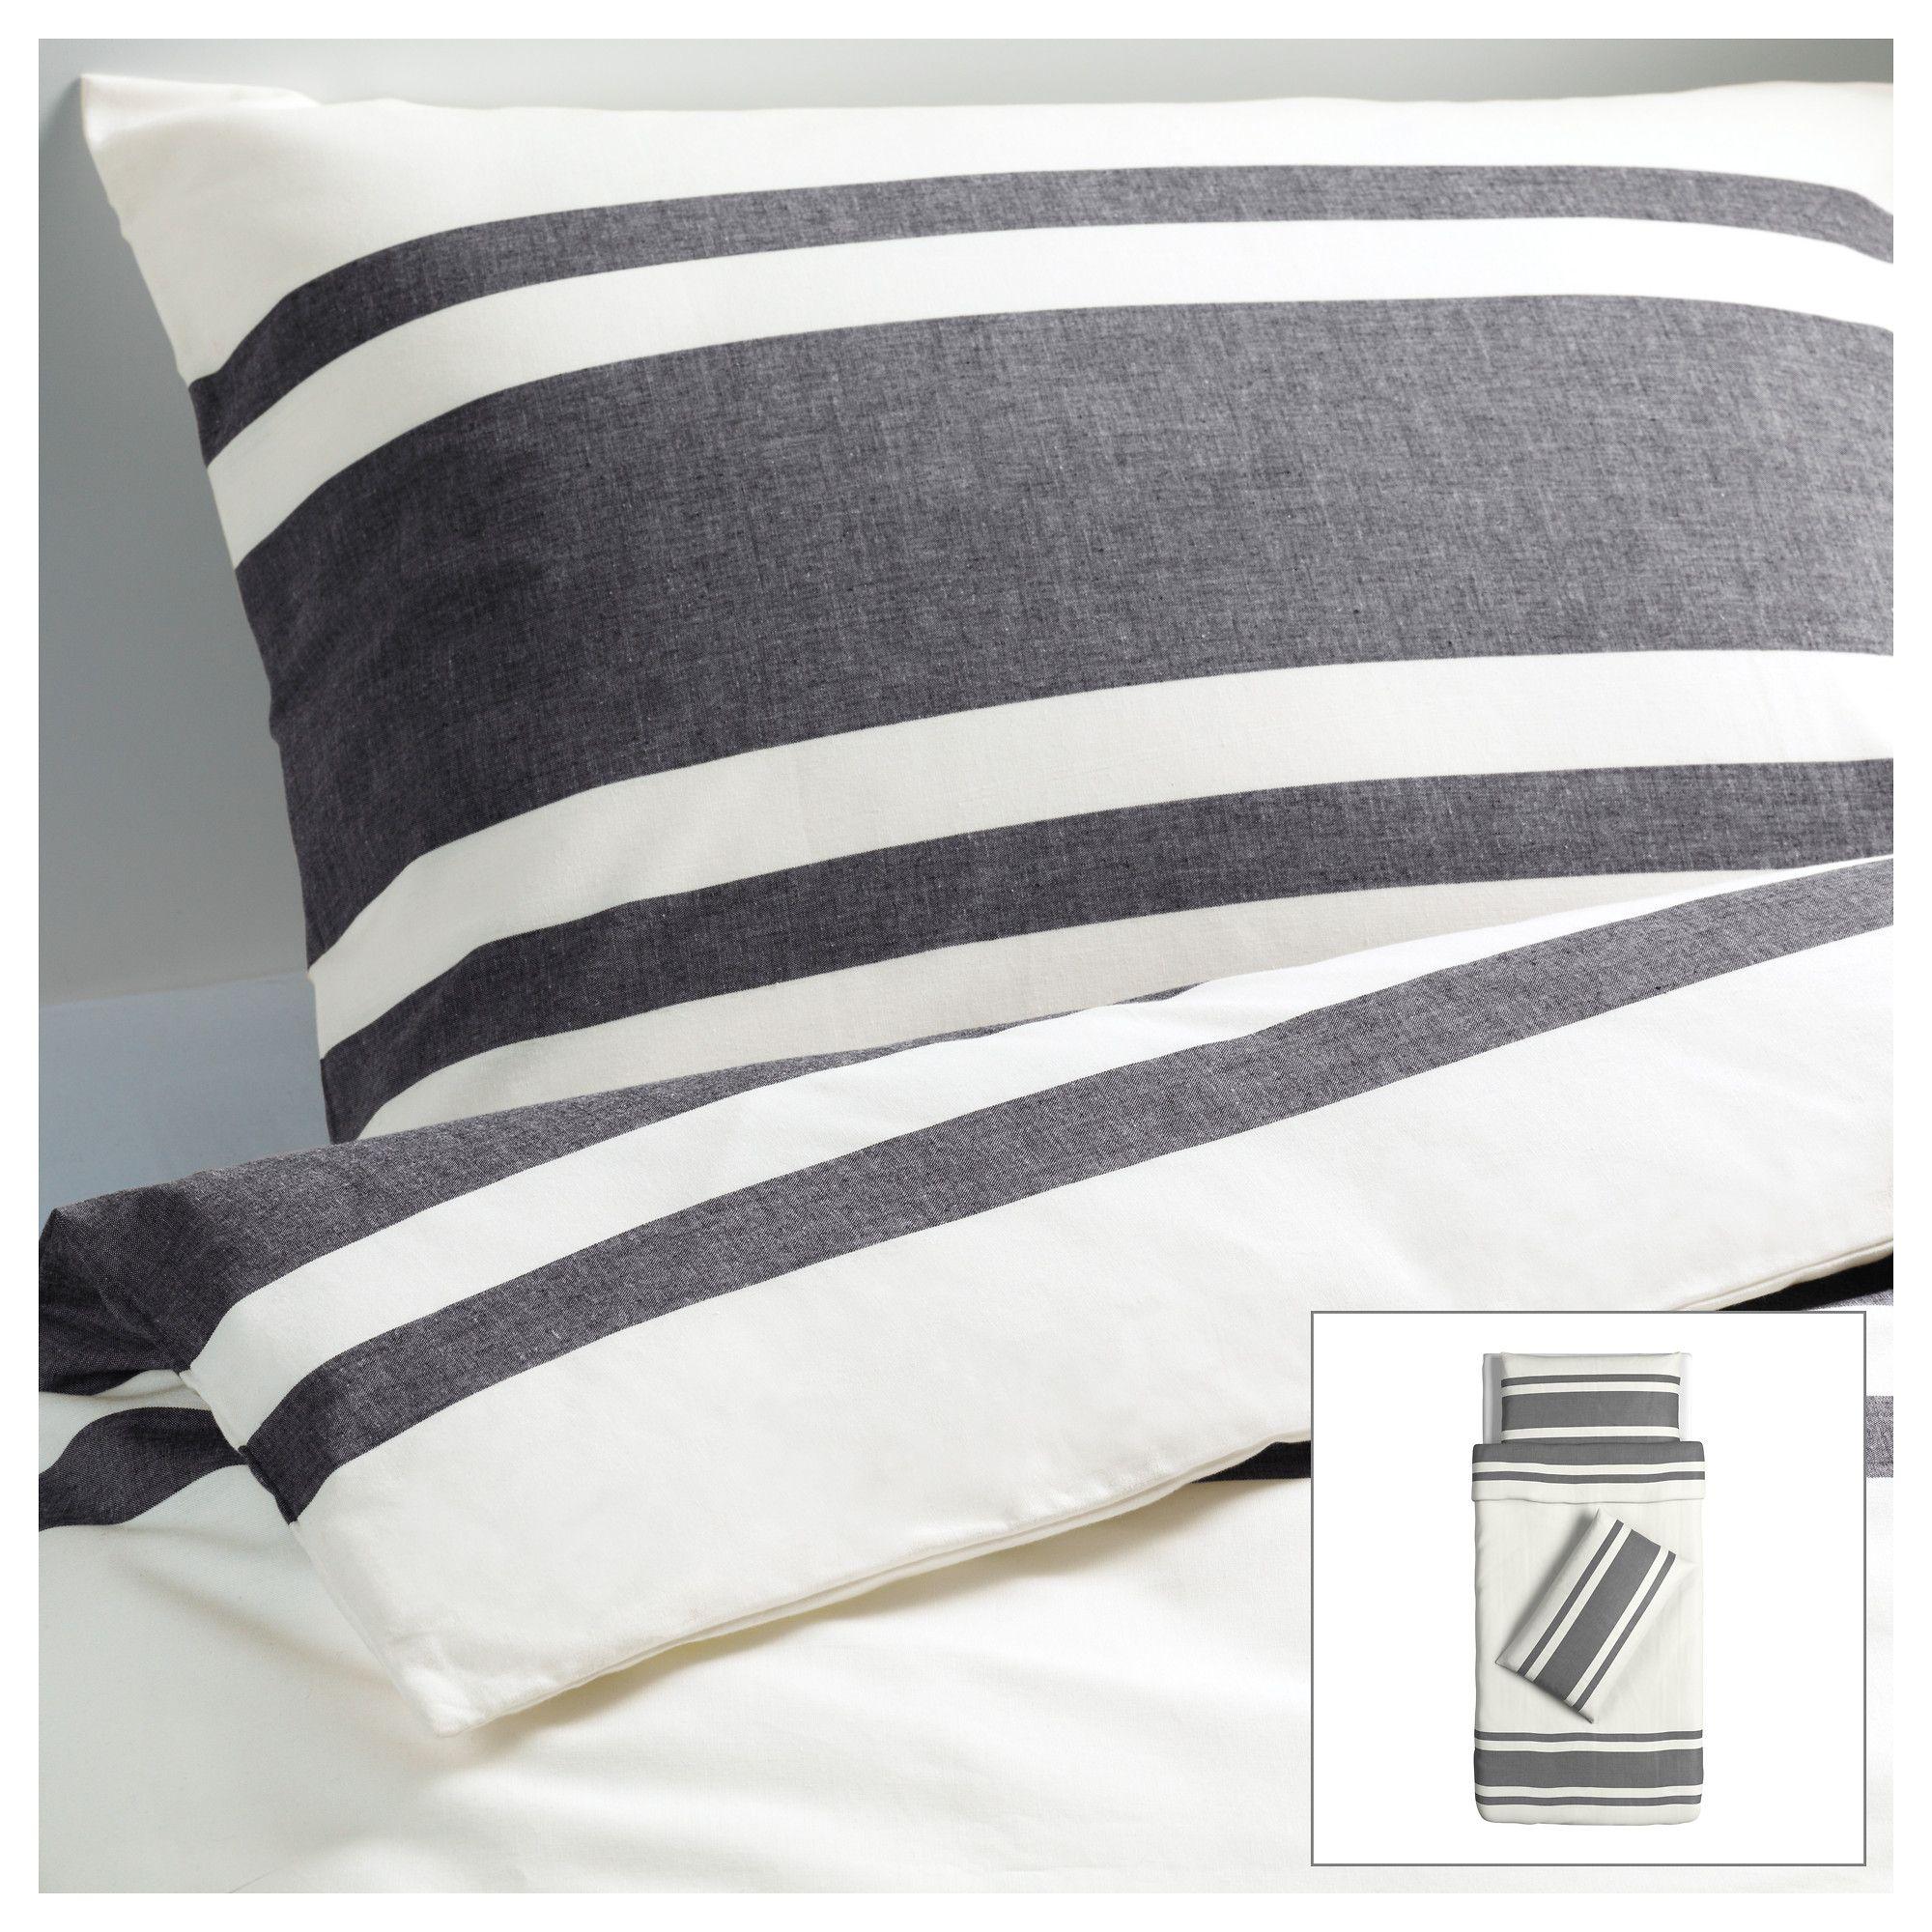 Australia Ikea duvet cover, Duvet covers cheap, Ikea bed